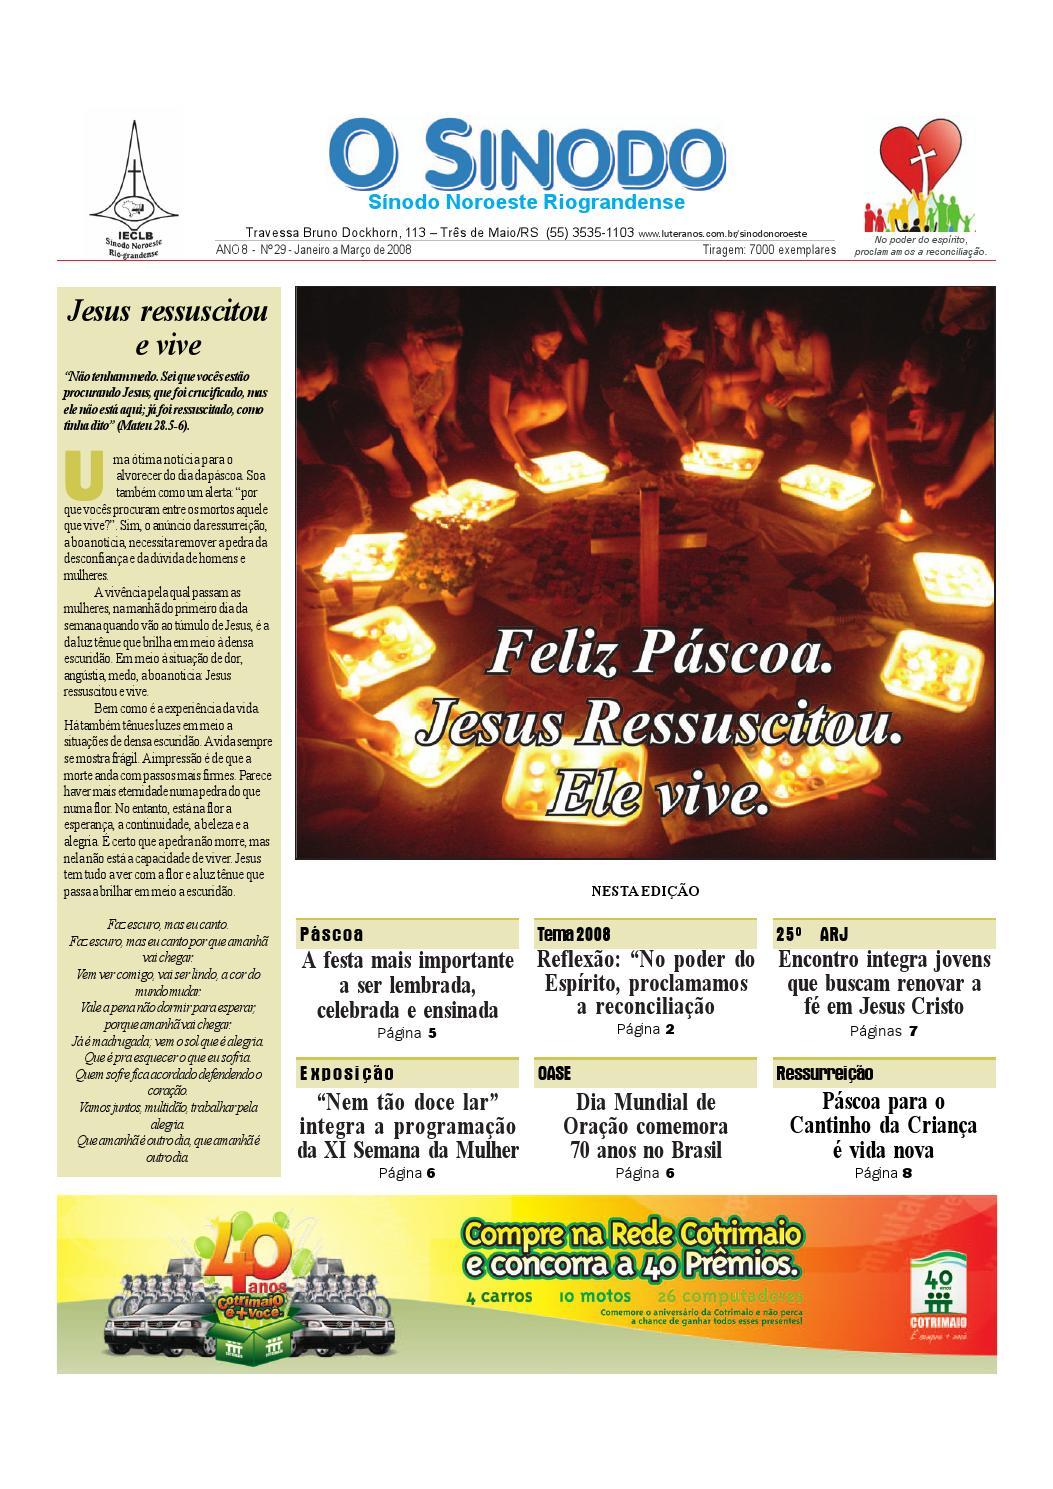 1ea41218e2a49 Jornal O Sínodo - Nº. 29 – Janeiro - Março 2008 by Portal Luteranos - IECLB  - issuu